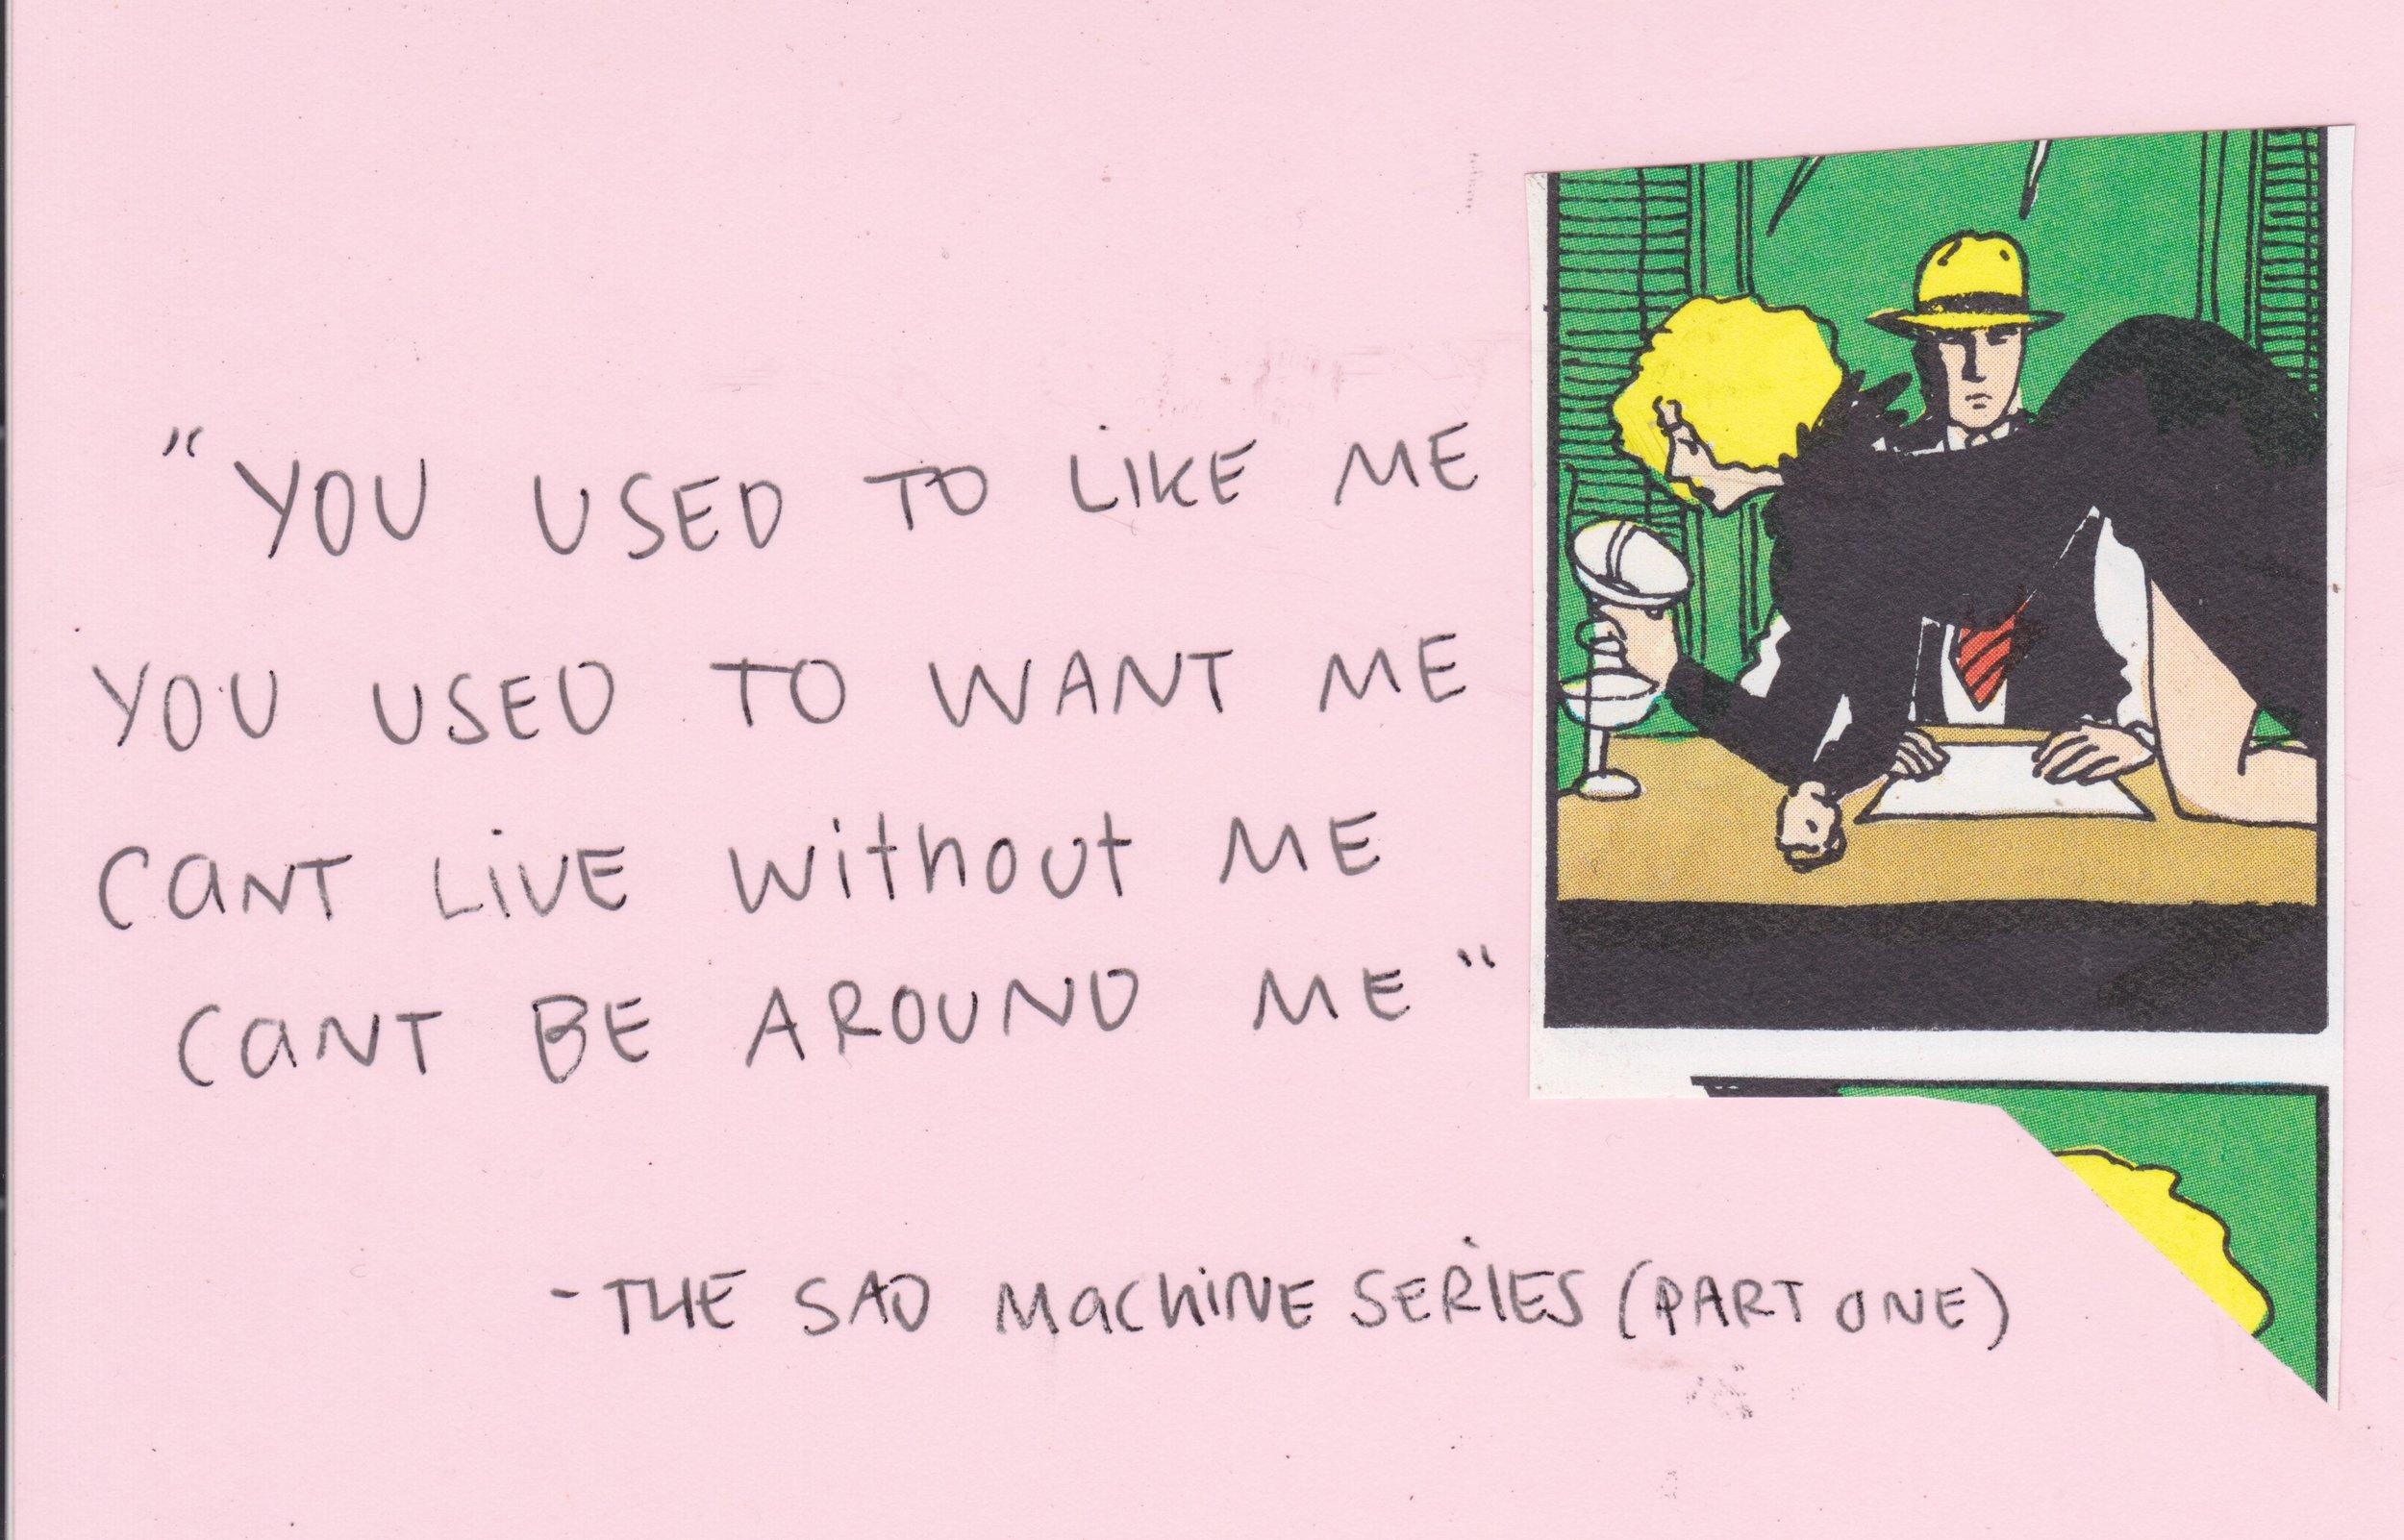 Sad Machine Series Quotes 6.jpeg